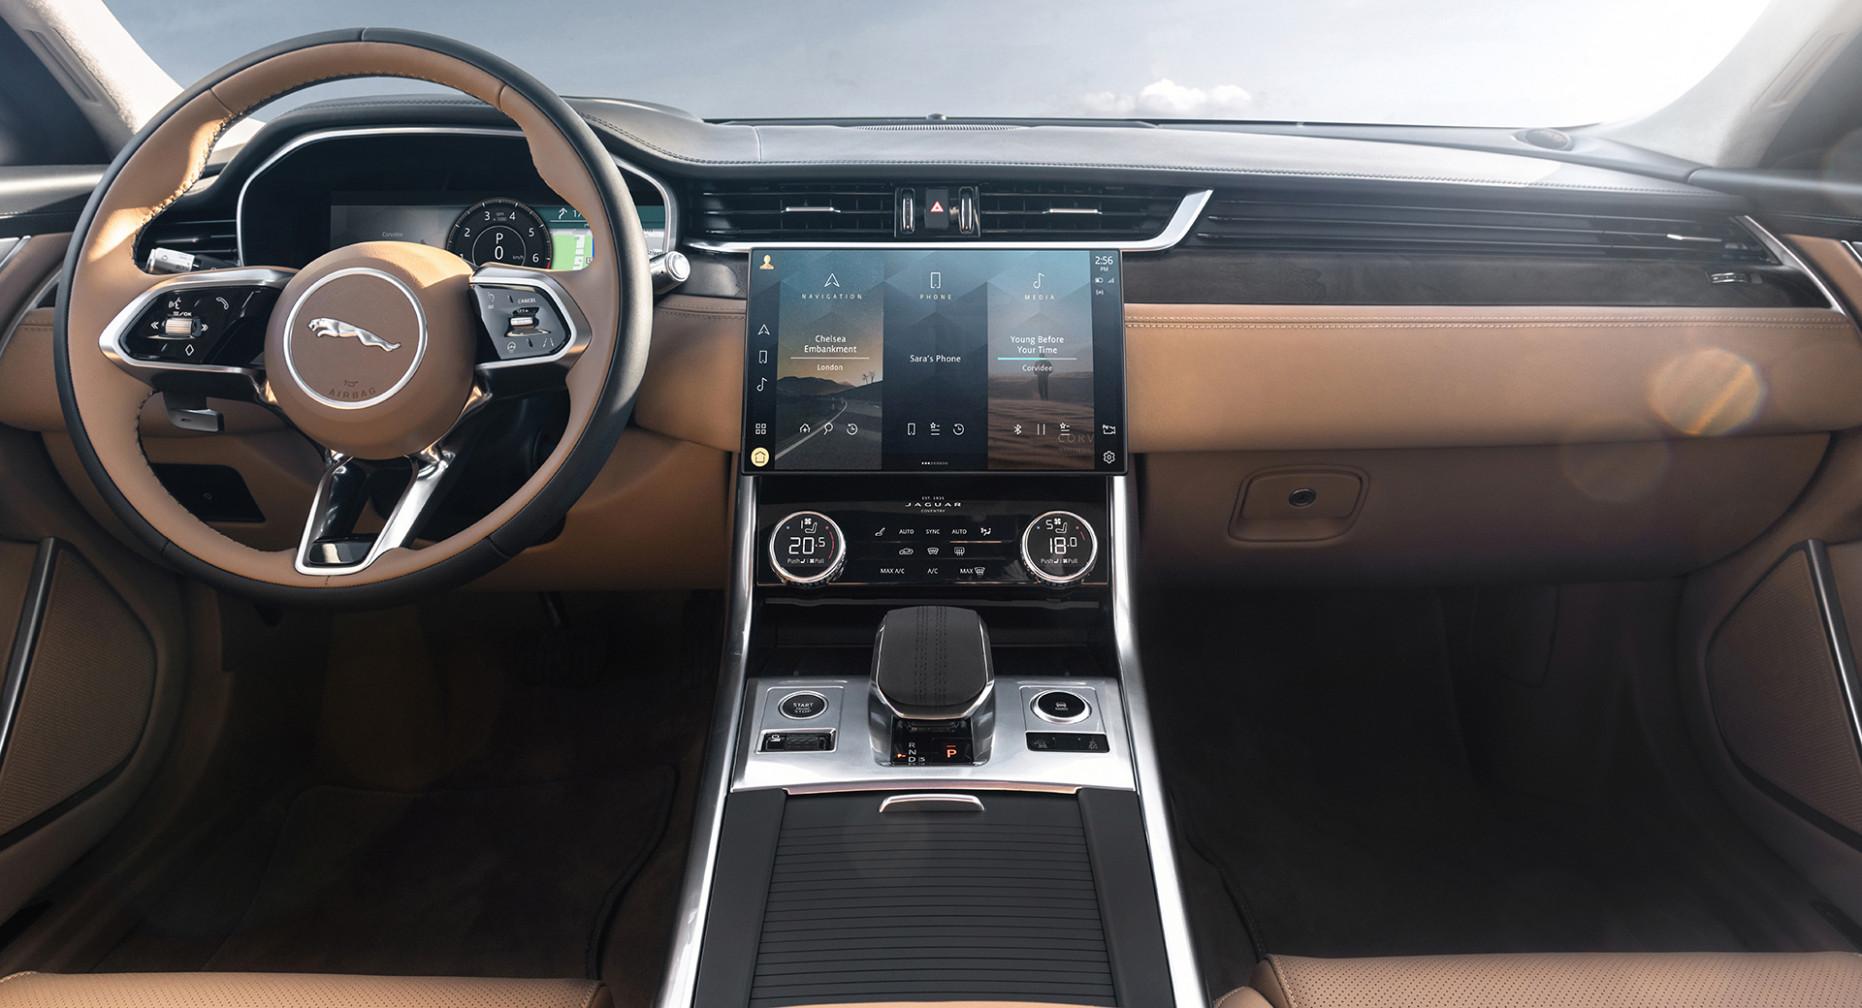 New Model and Performance New Jaguar Xe 2022 Interior